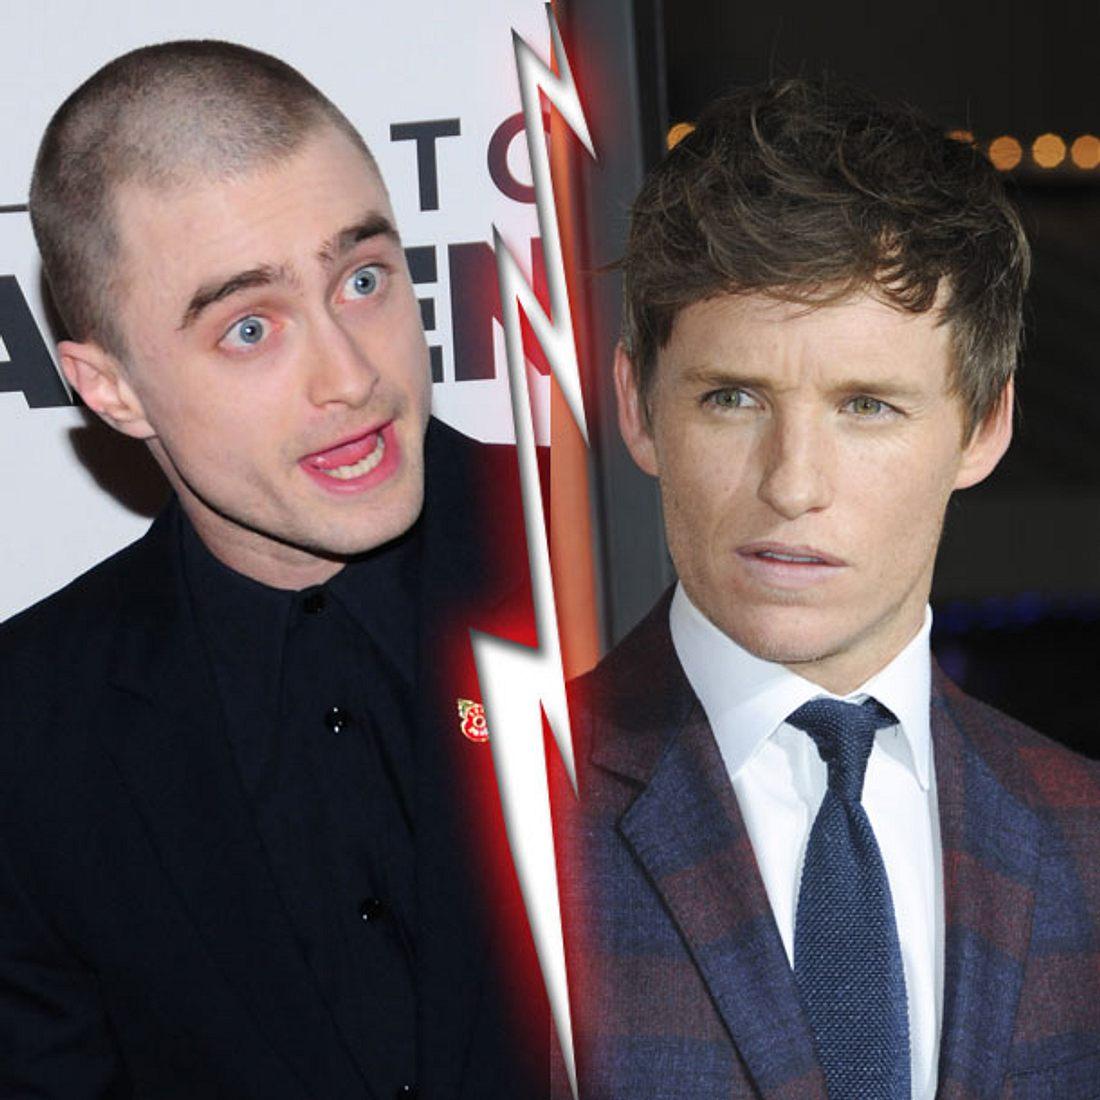 Daniel Radcliffe vs. Eddie Redmayne